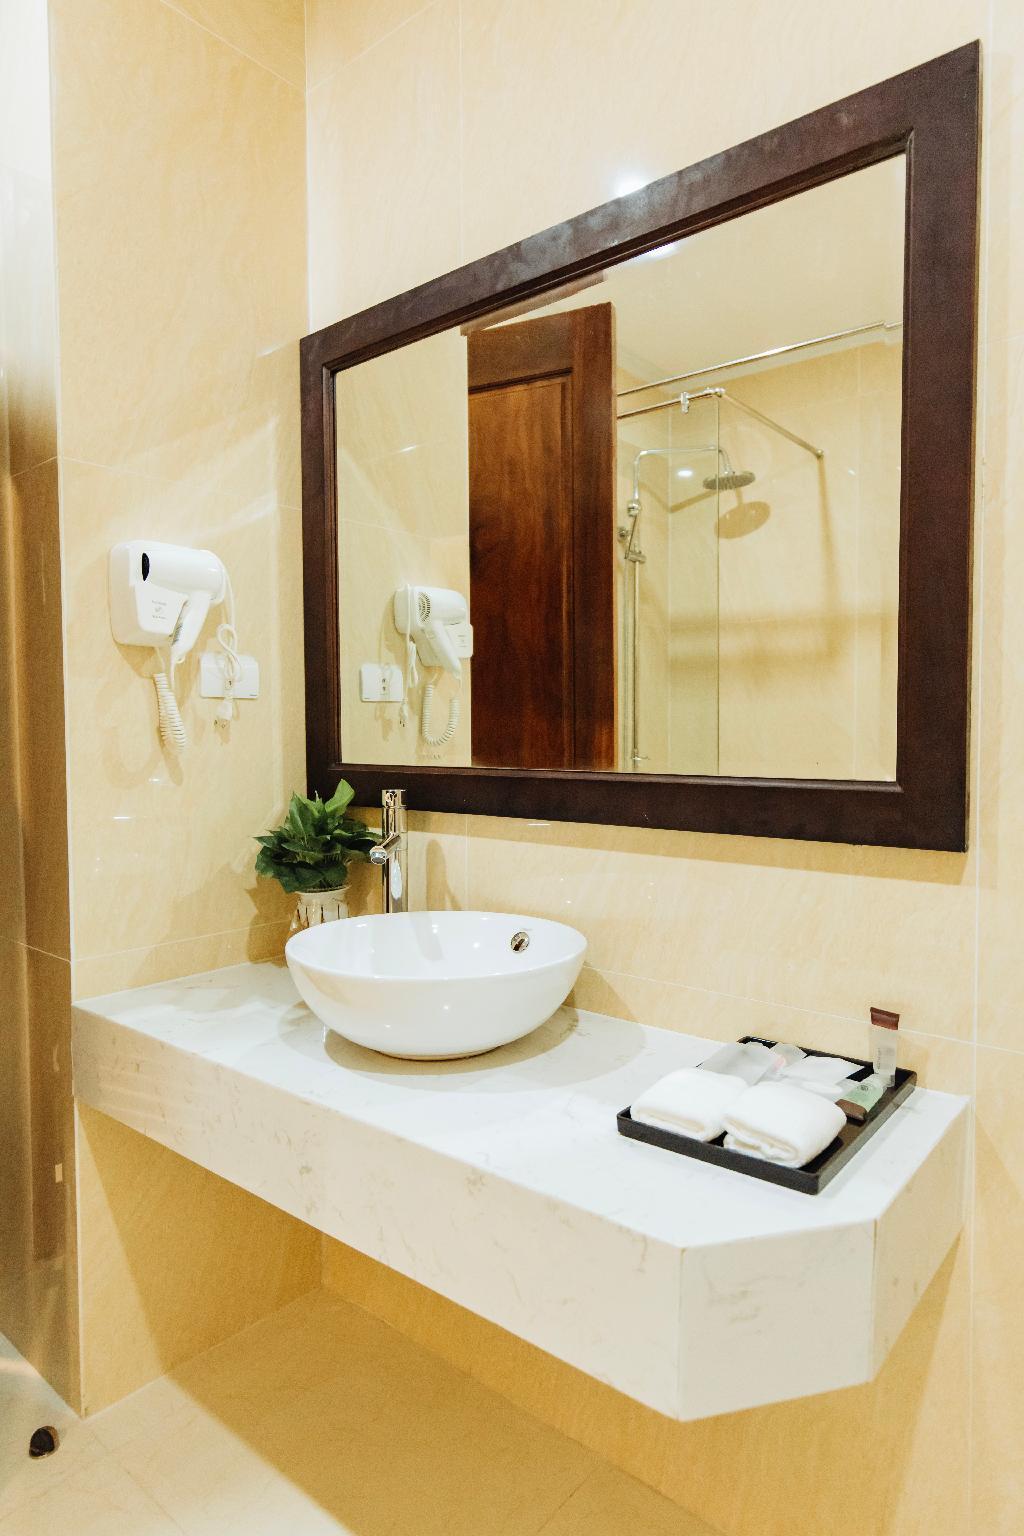 Paragon Noi Bai Hotel And Pool